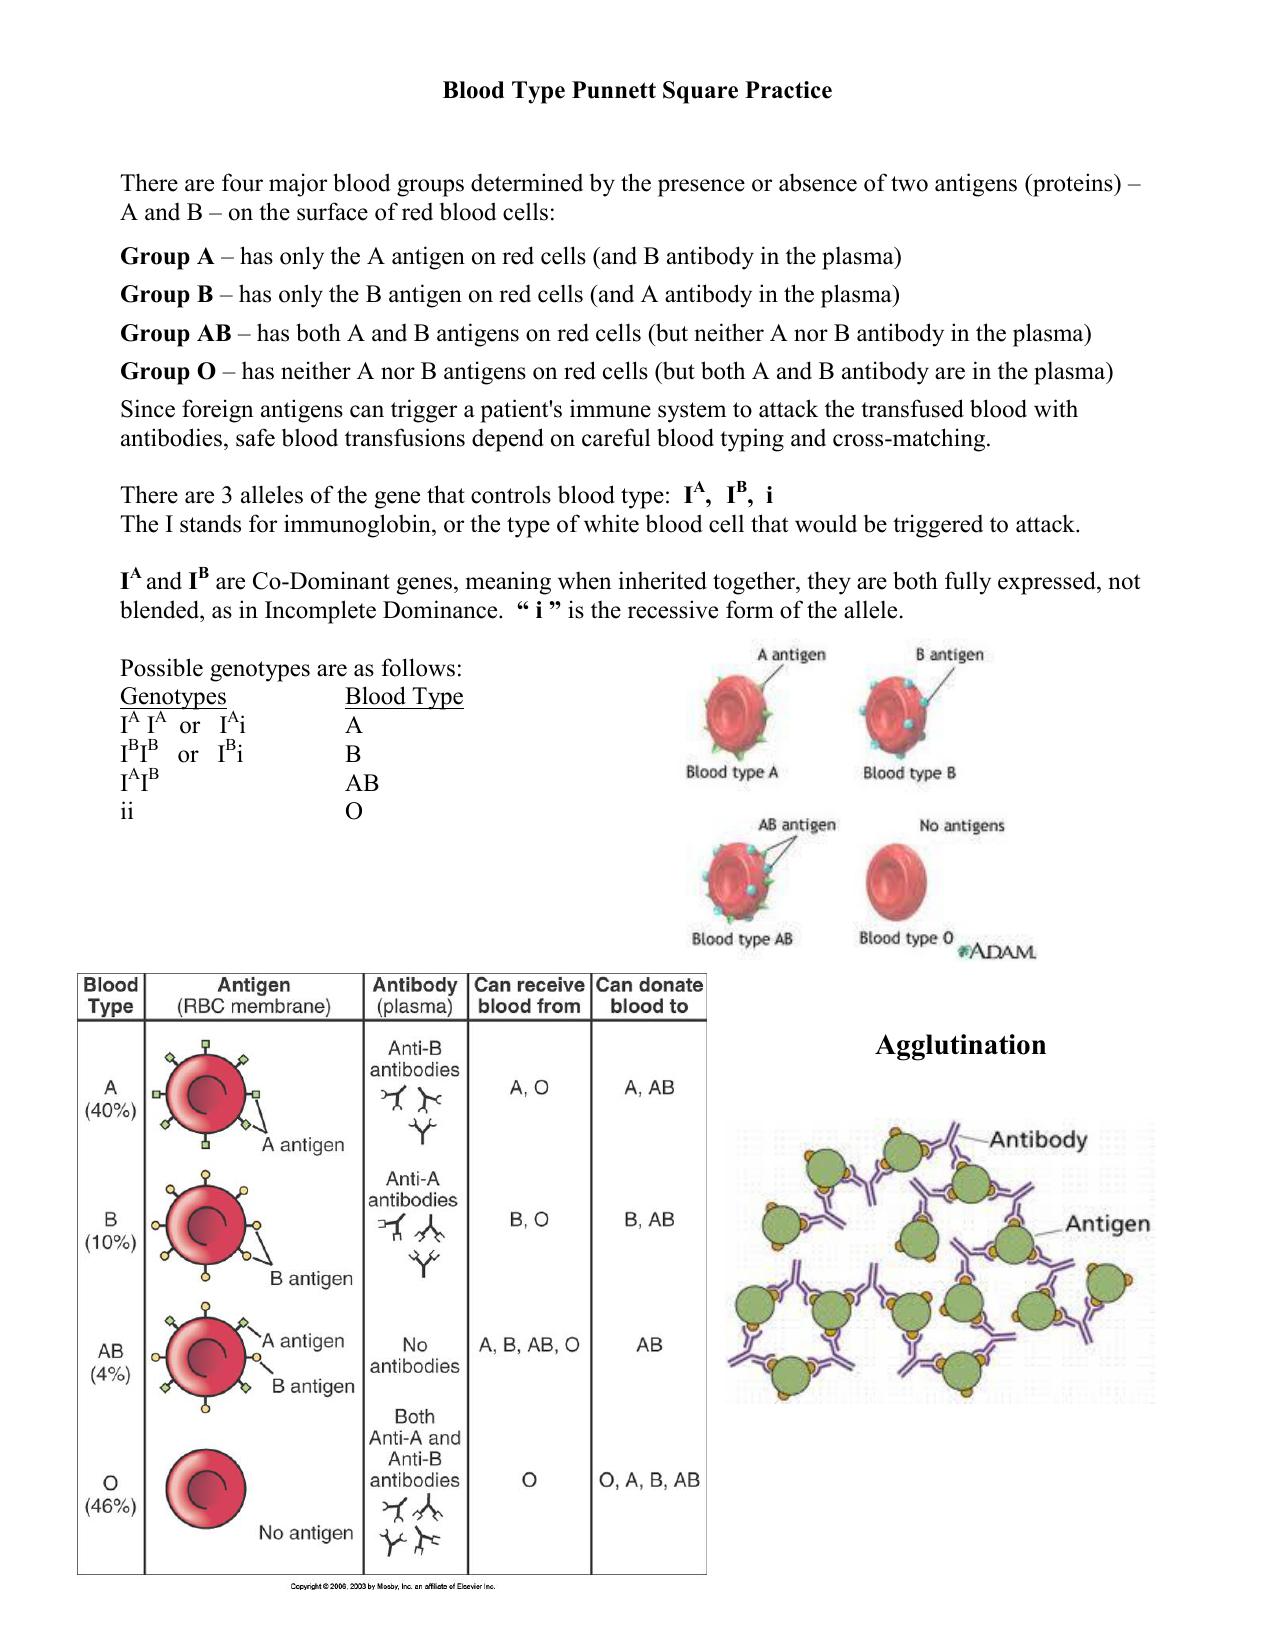 Blood Type Punnett Square Practice | db-excel.com